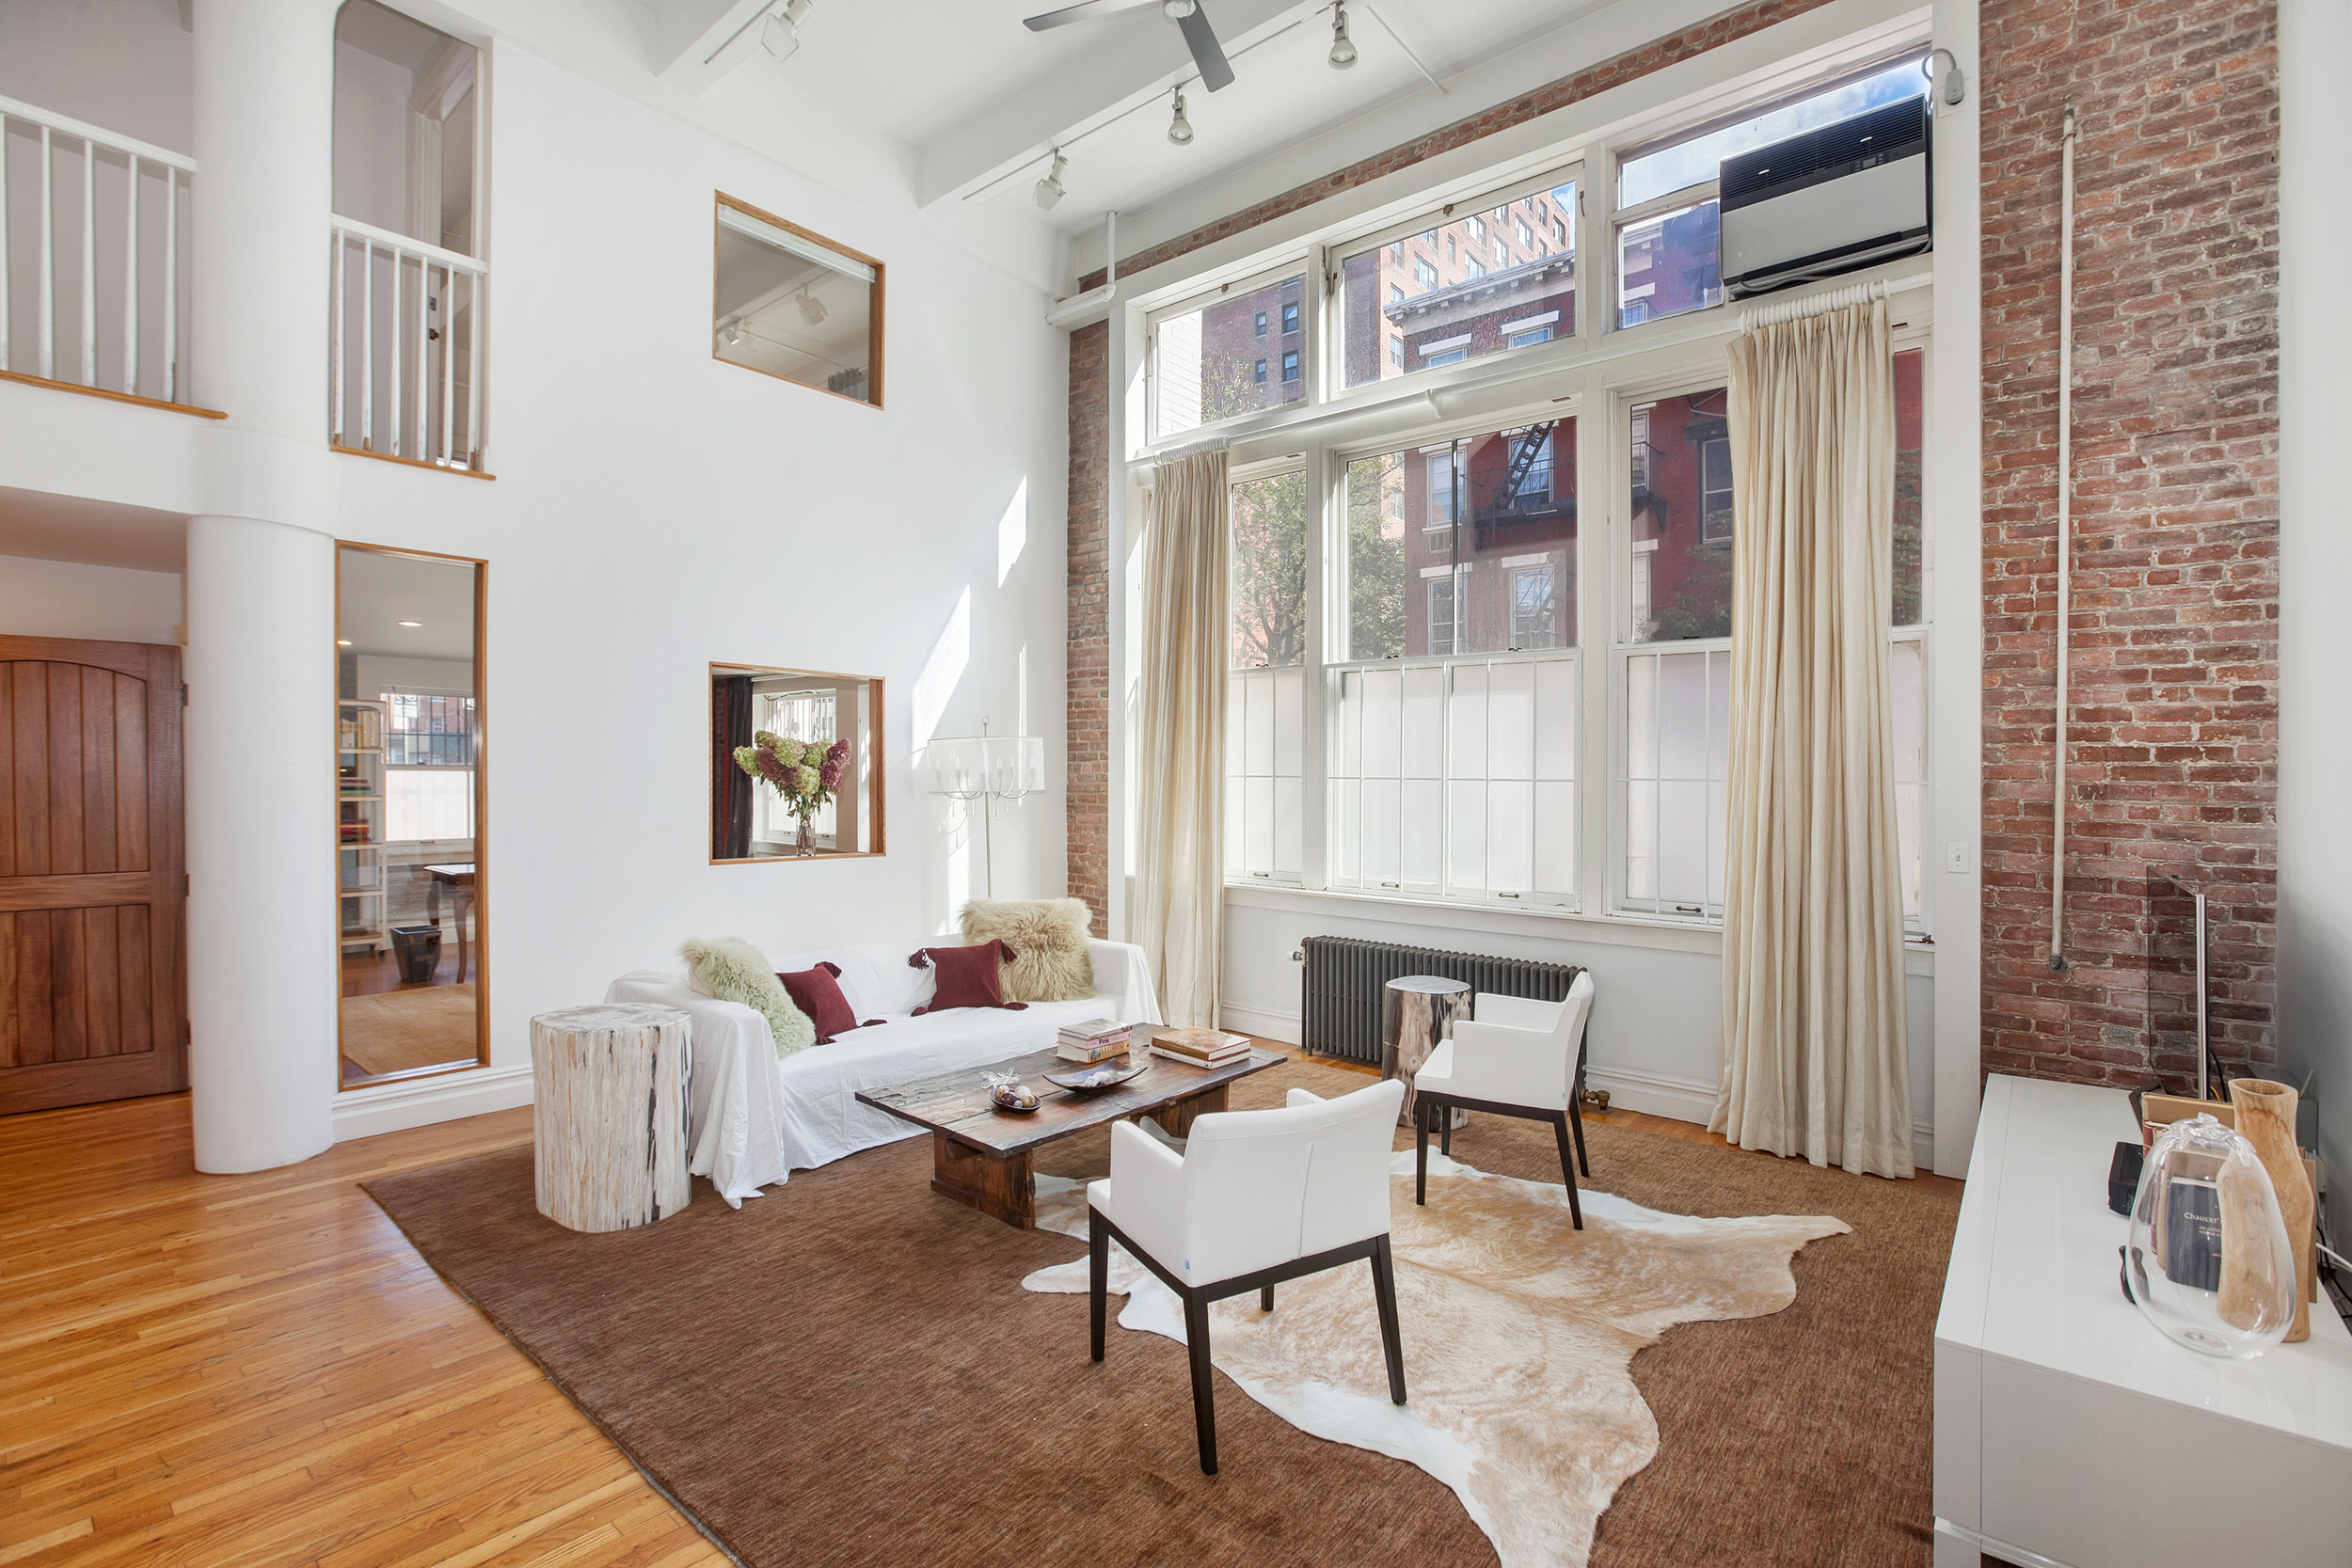 68 Jane Street #1E - $5,250,000